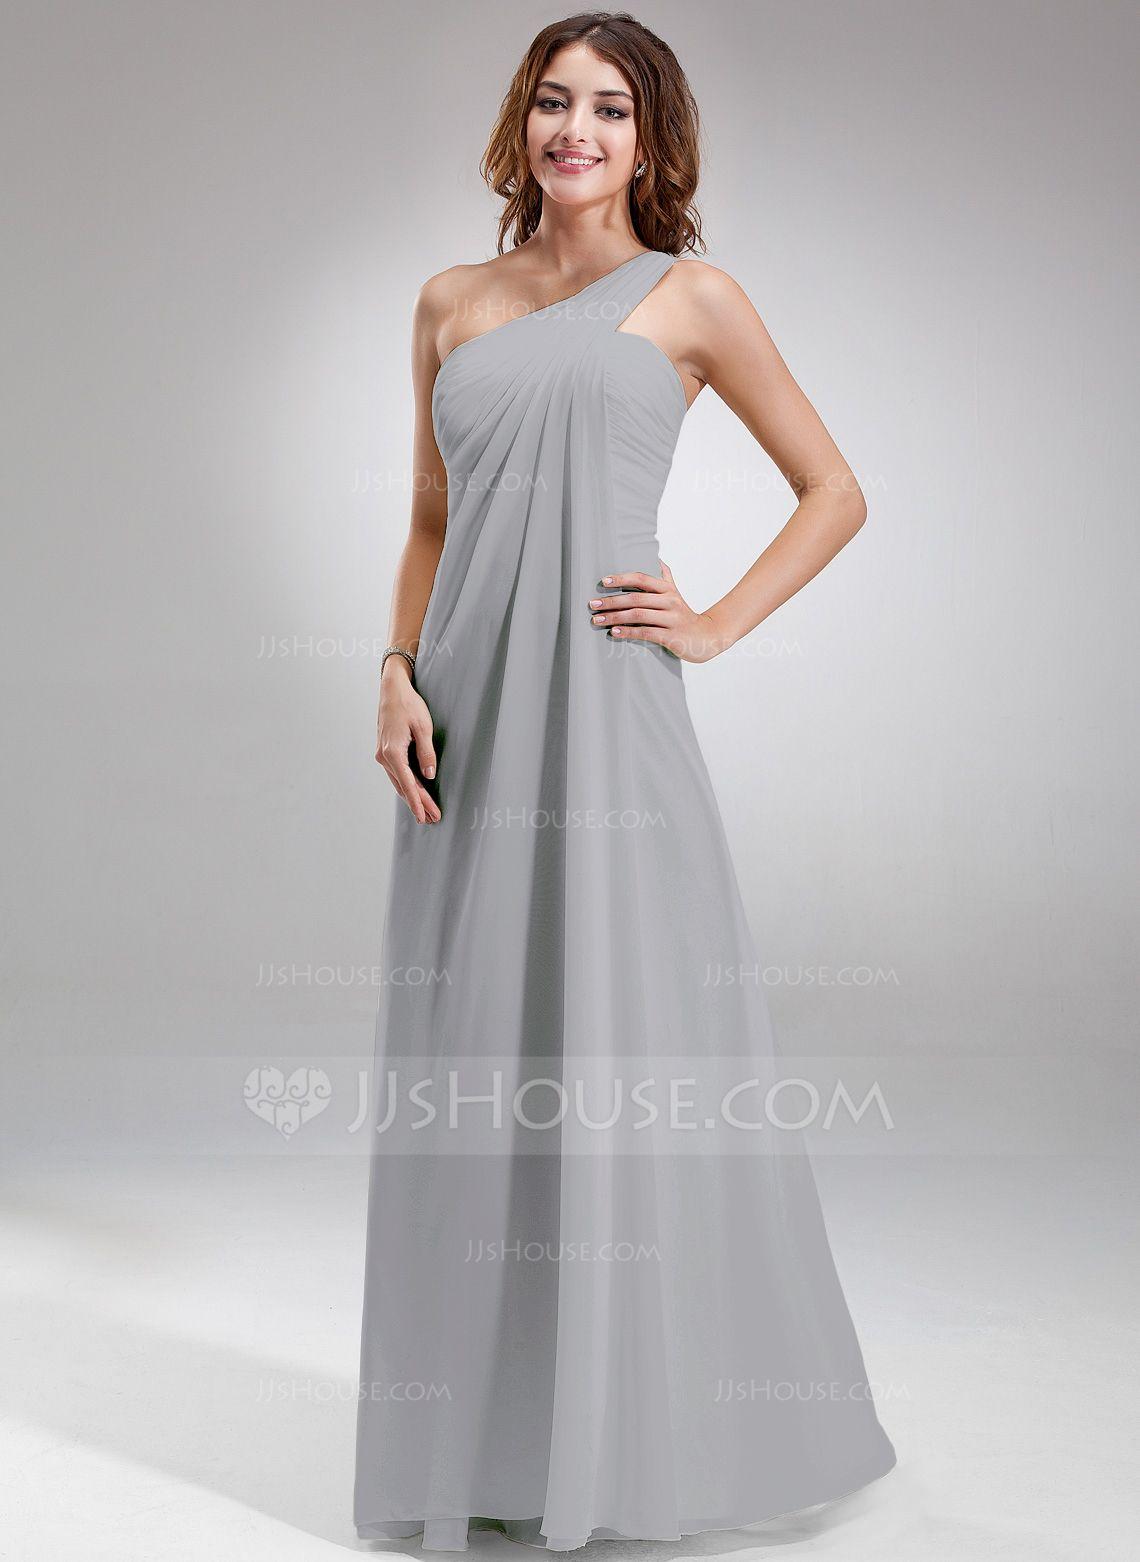 f2c2163cc86 Long One Shoulder Bridesmaid Dress With Ruffles - Gomes Weine AG